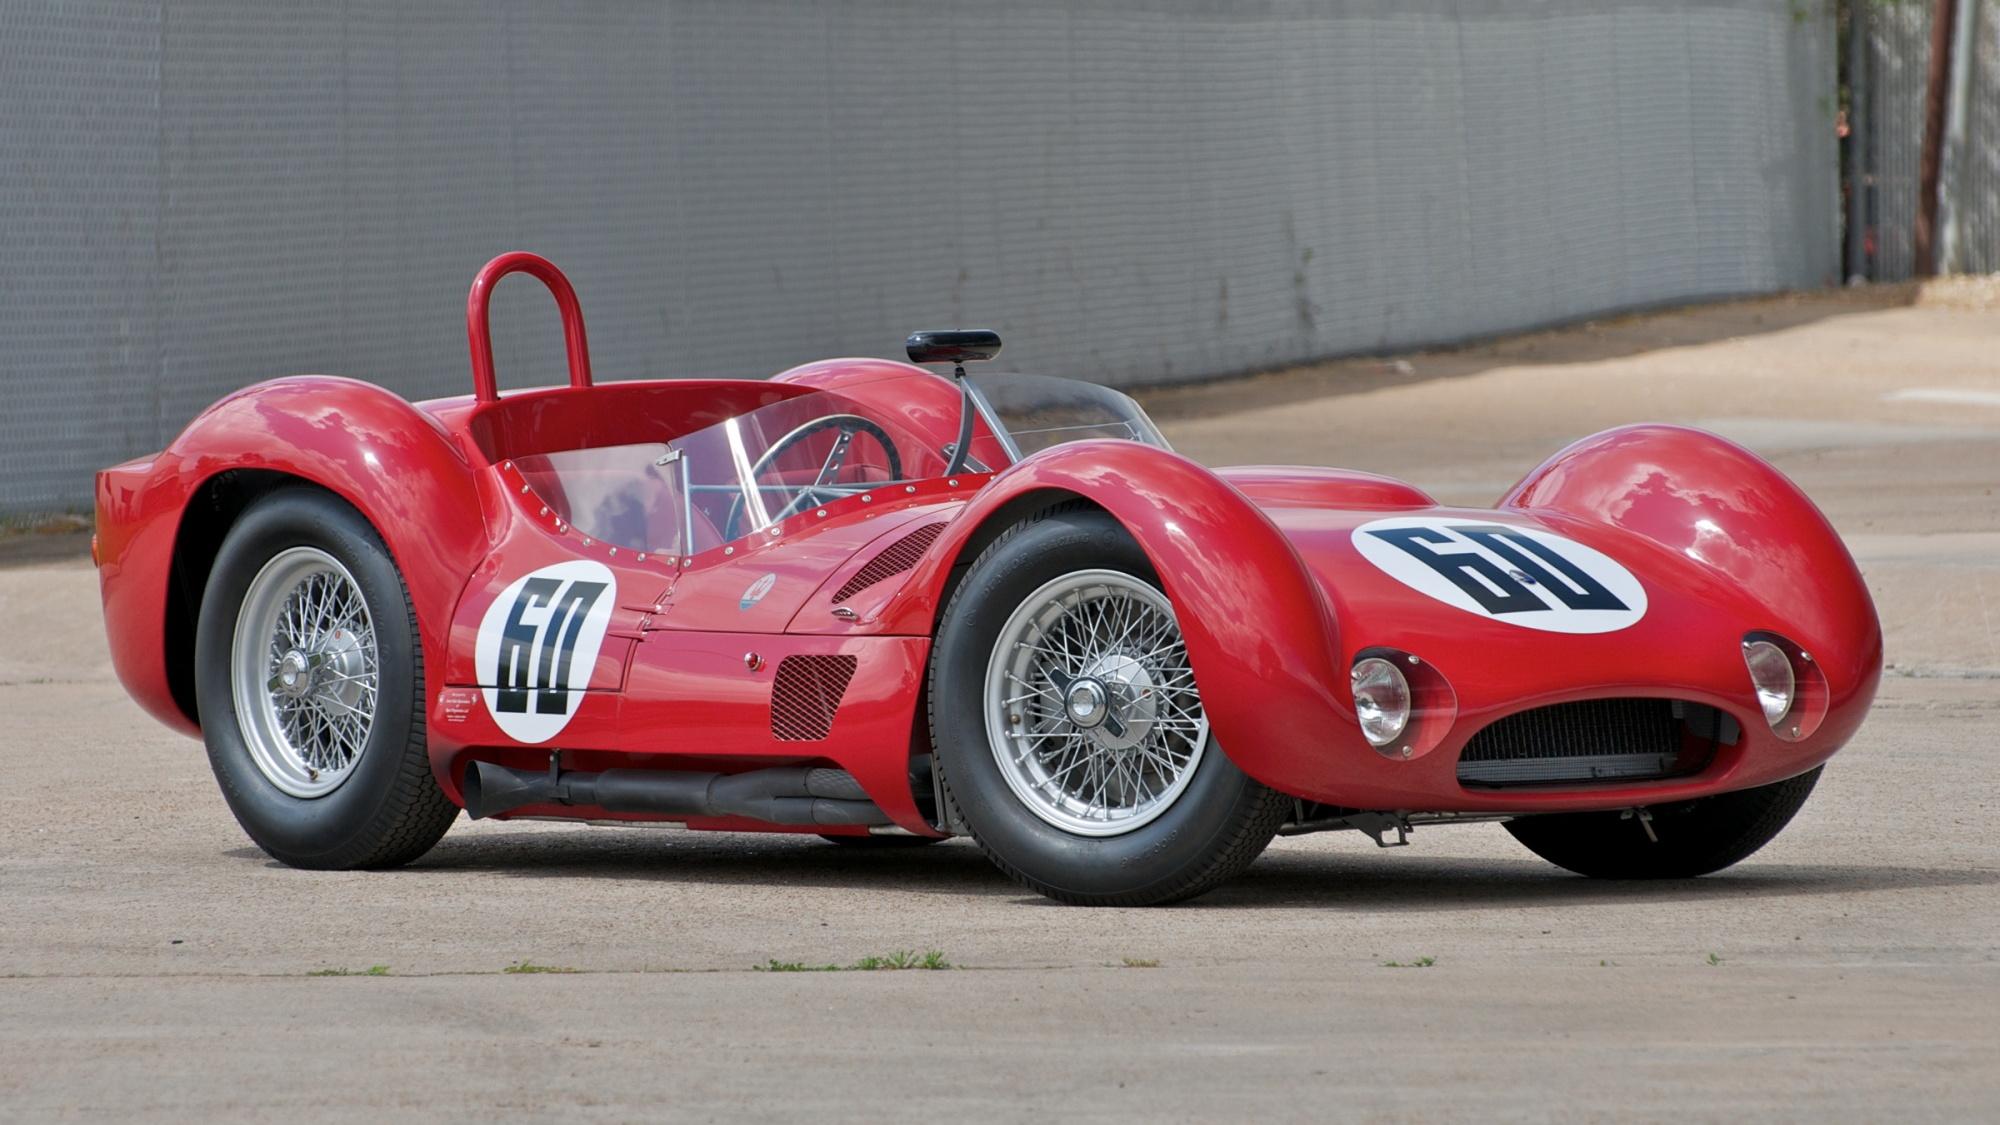 1959 Maserati Tipo 61/60 'Birdcage' reconstruction